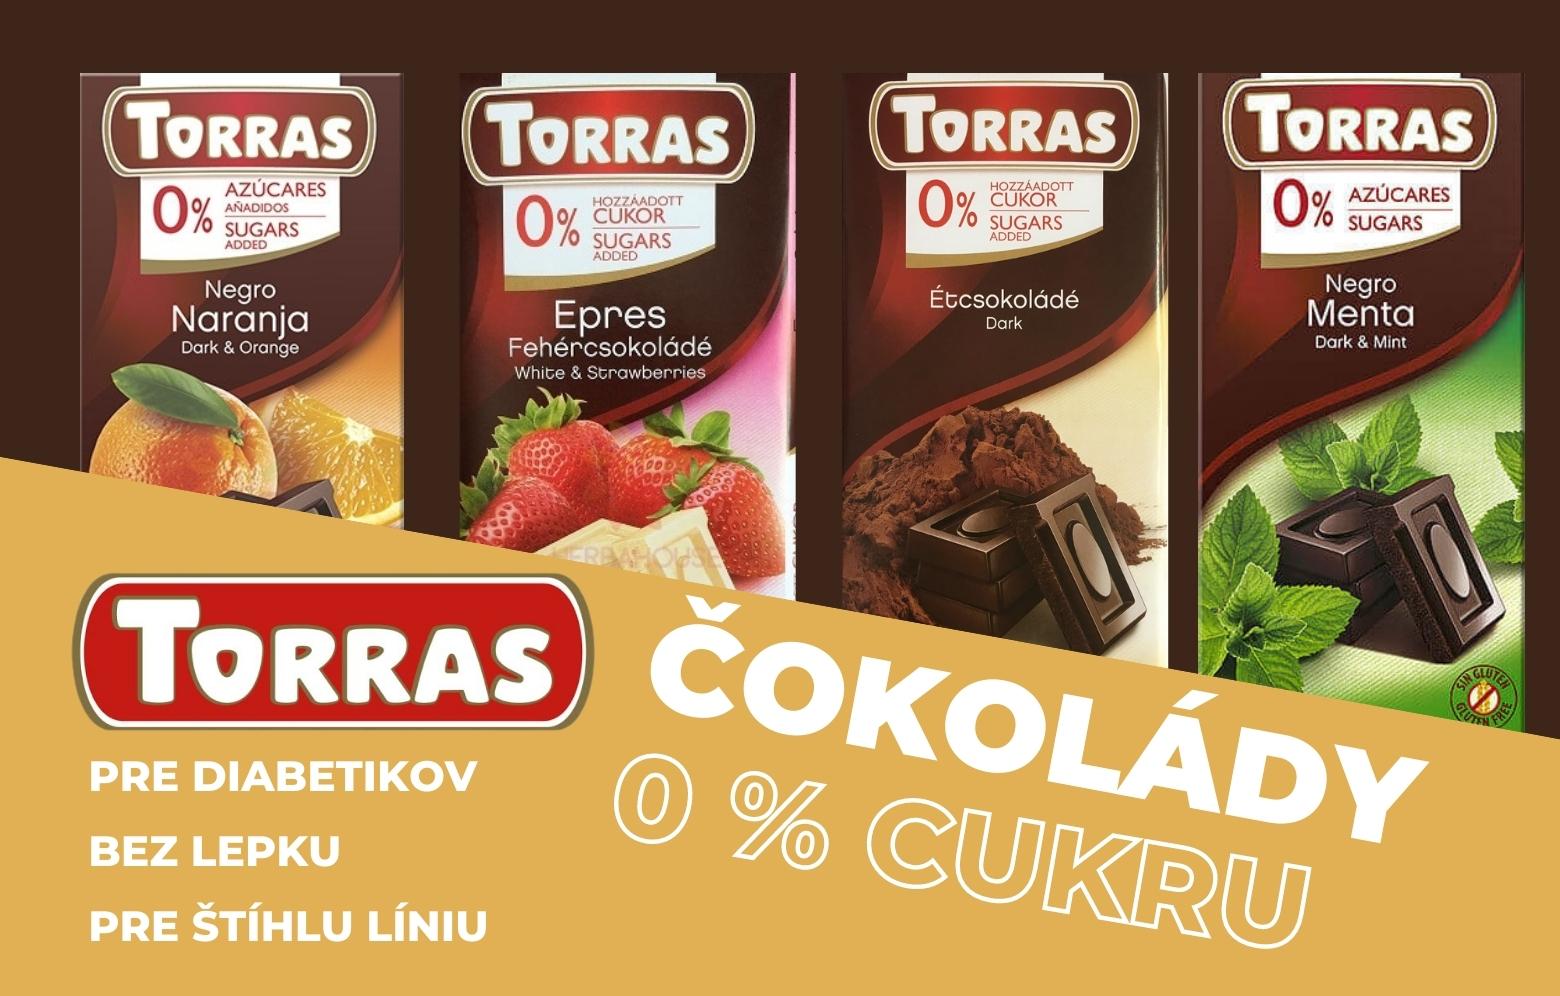 torras cokolady